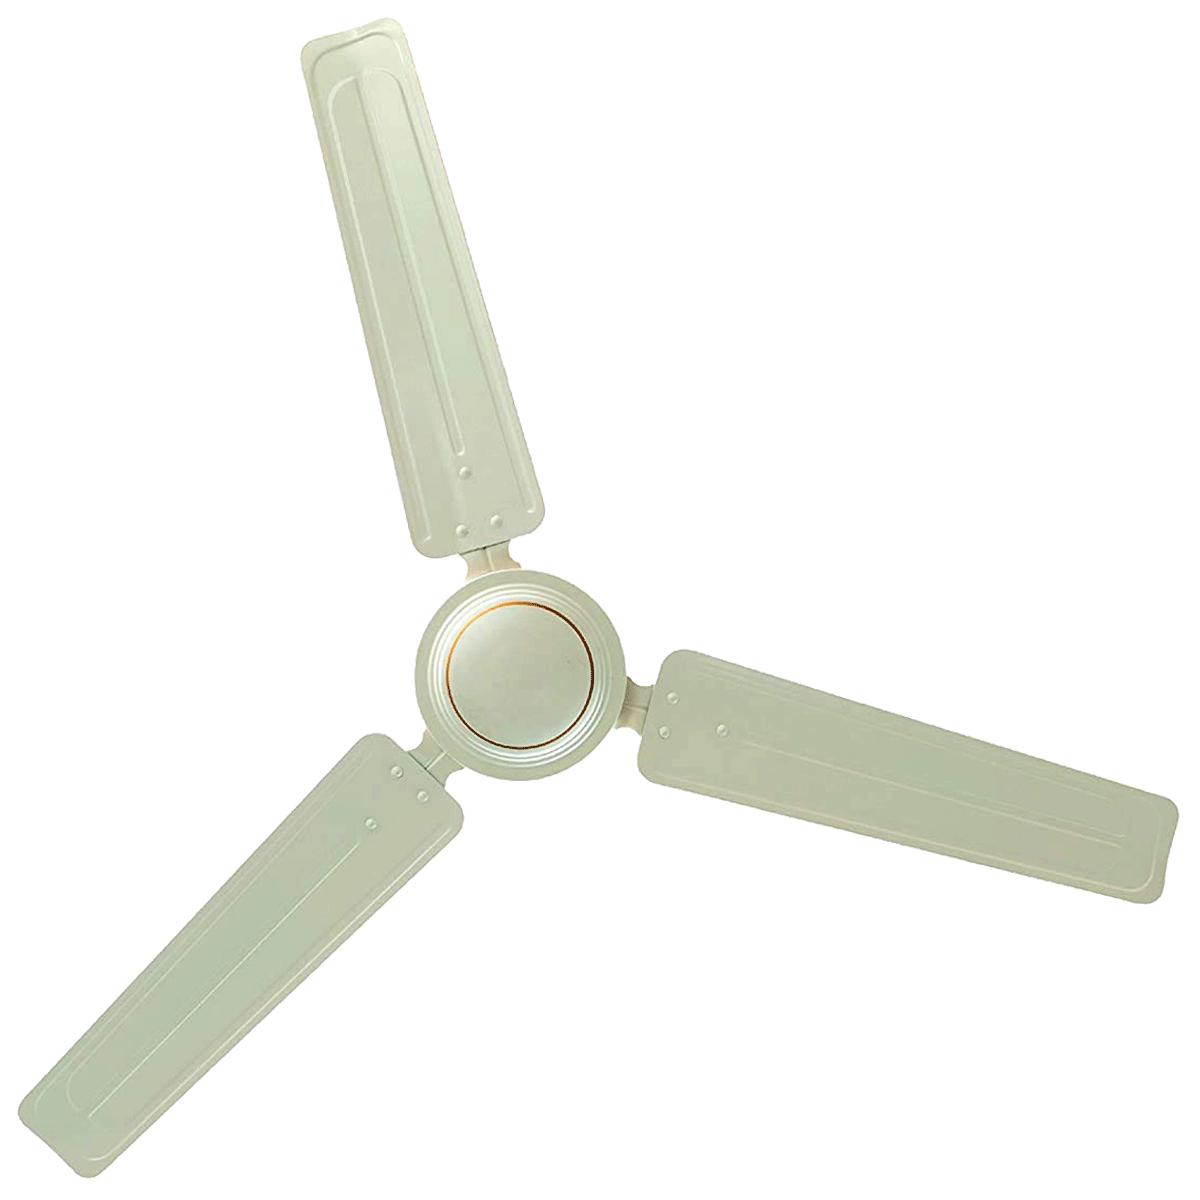 Lifelong Glide 120cm Sweep 3 Blade Ceiling Fan (With Copper Motor, LLCF106, Ivory)_1